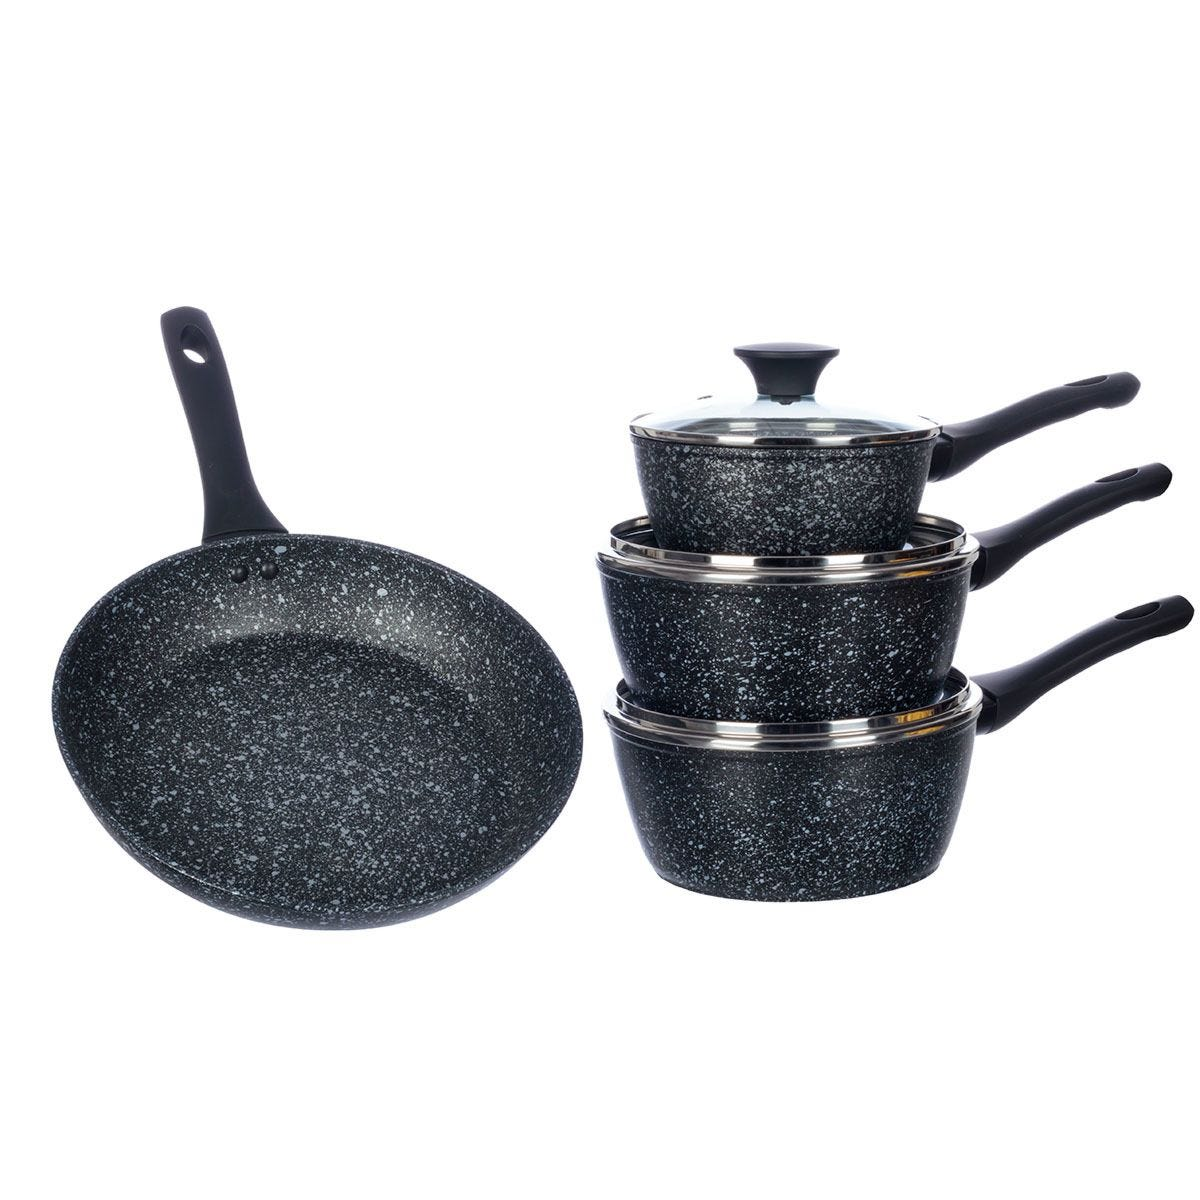 Salter Megastone 4-Piece Pan Set